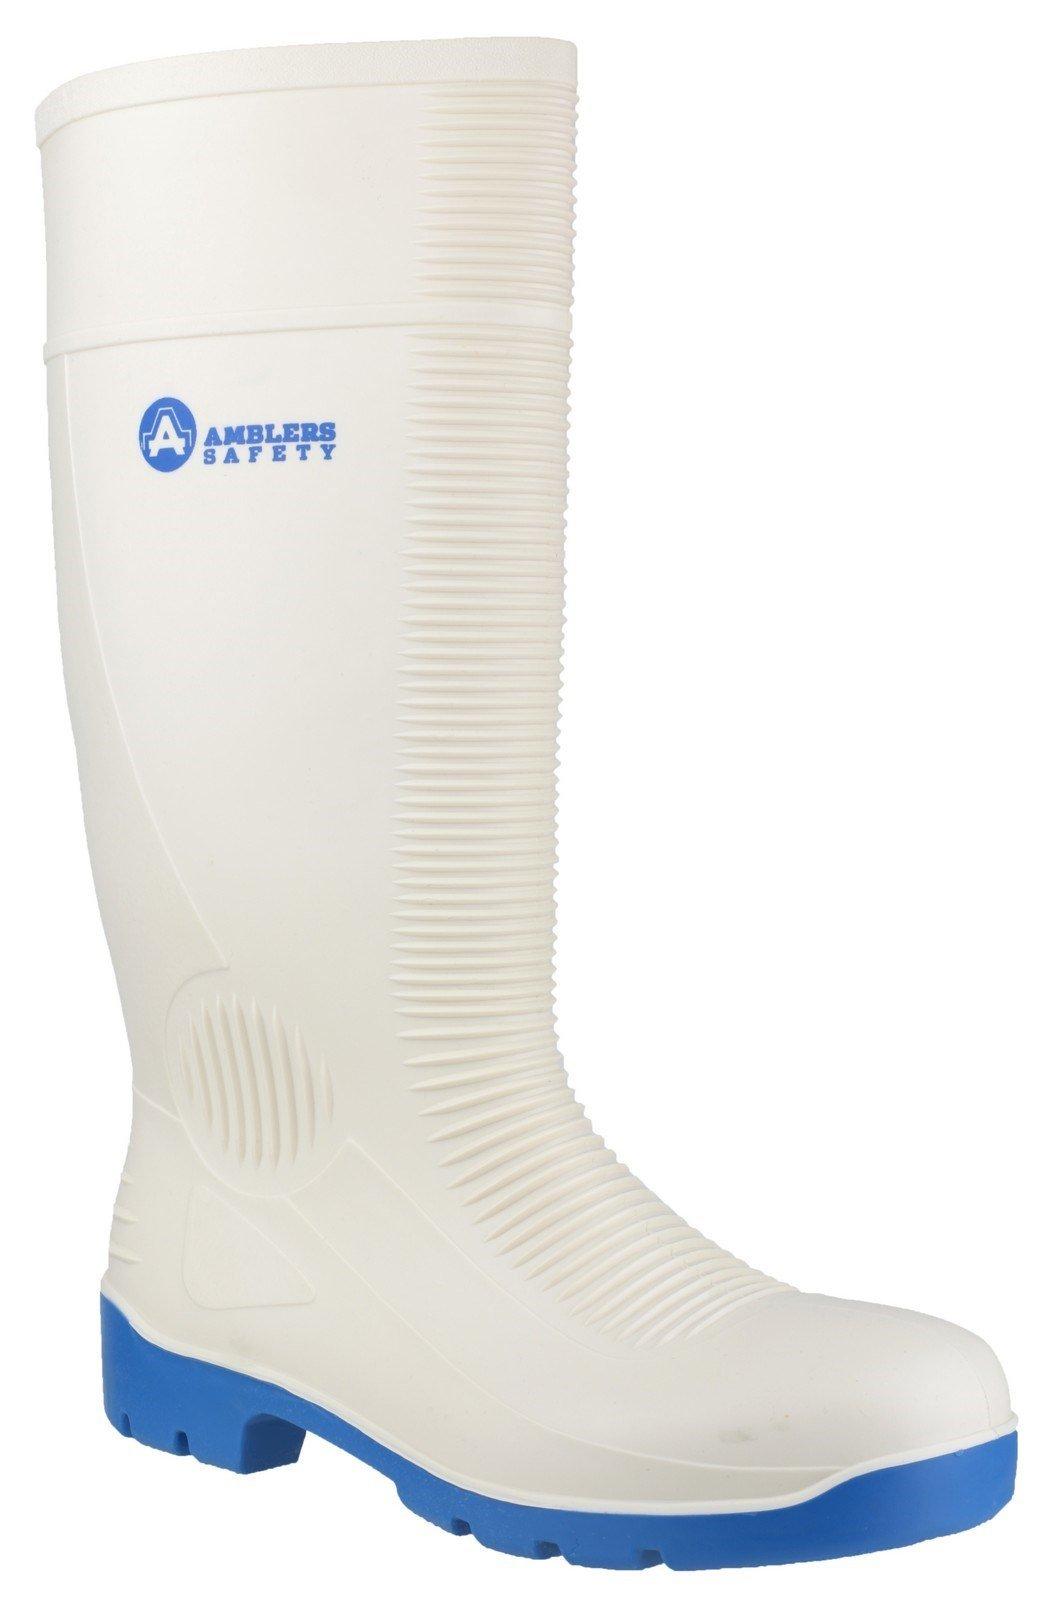 Amblers Unisex Safety Steel Toe Food Wellington Boot White 21232 - White 4